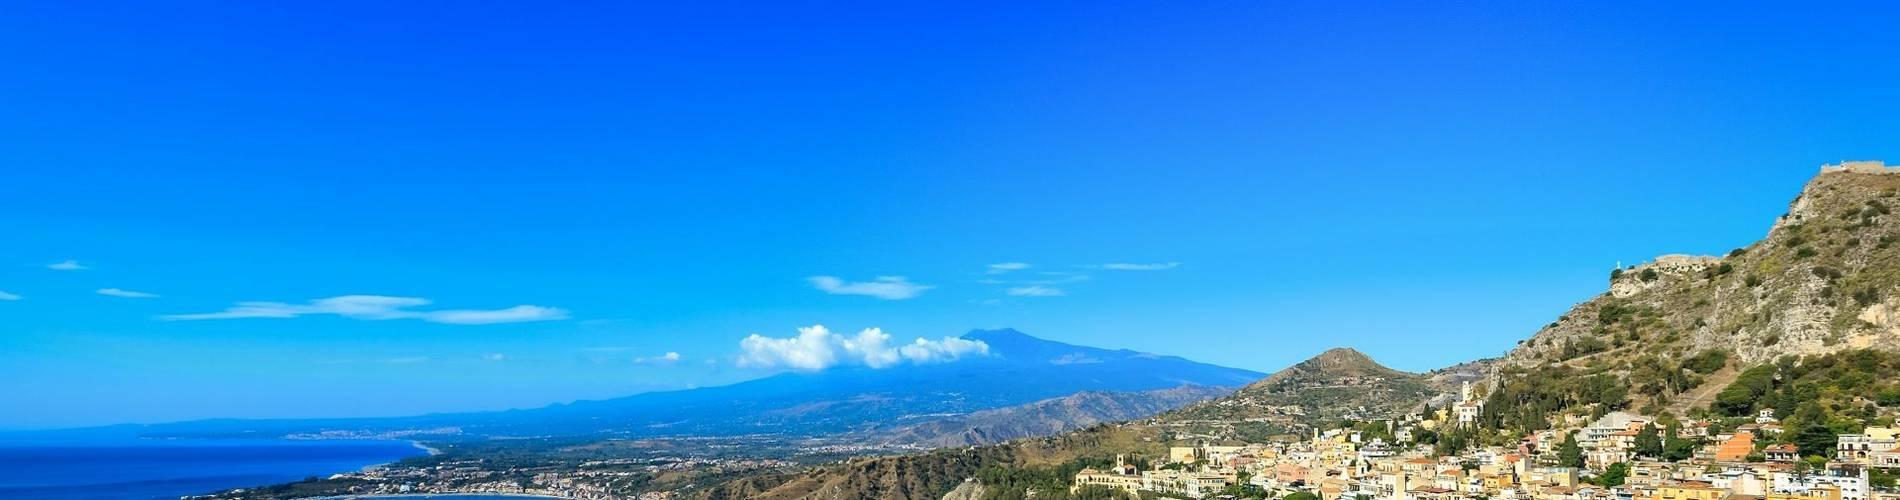 Sicily & Aeolian Island Intro Image.jpg